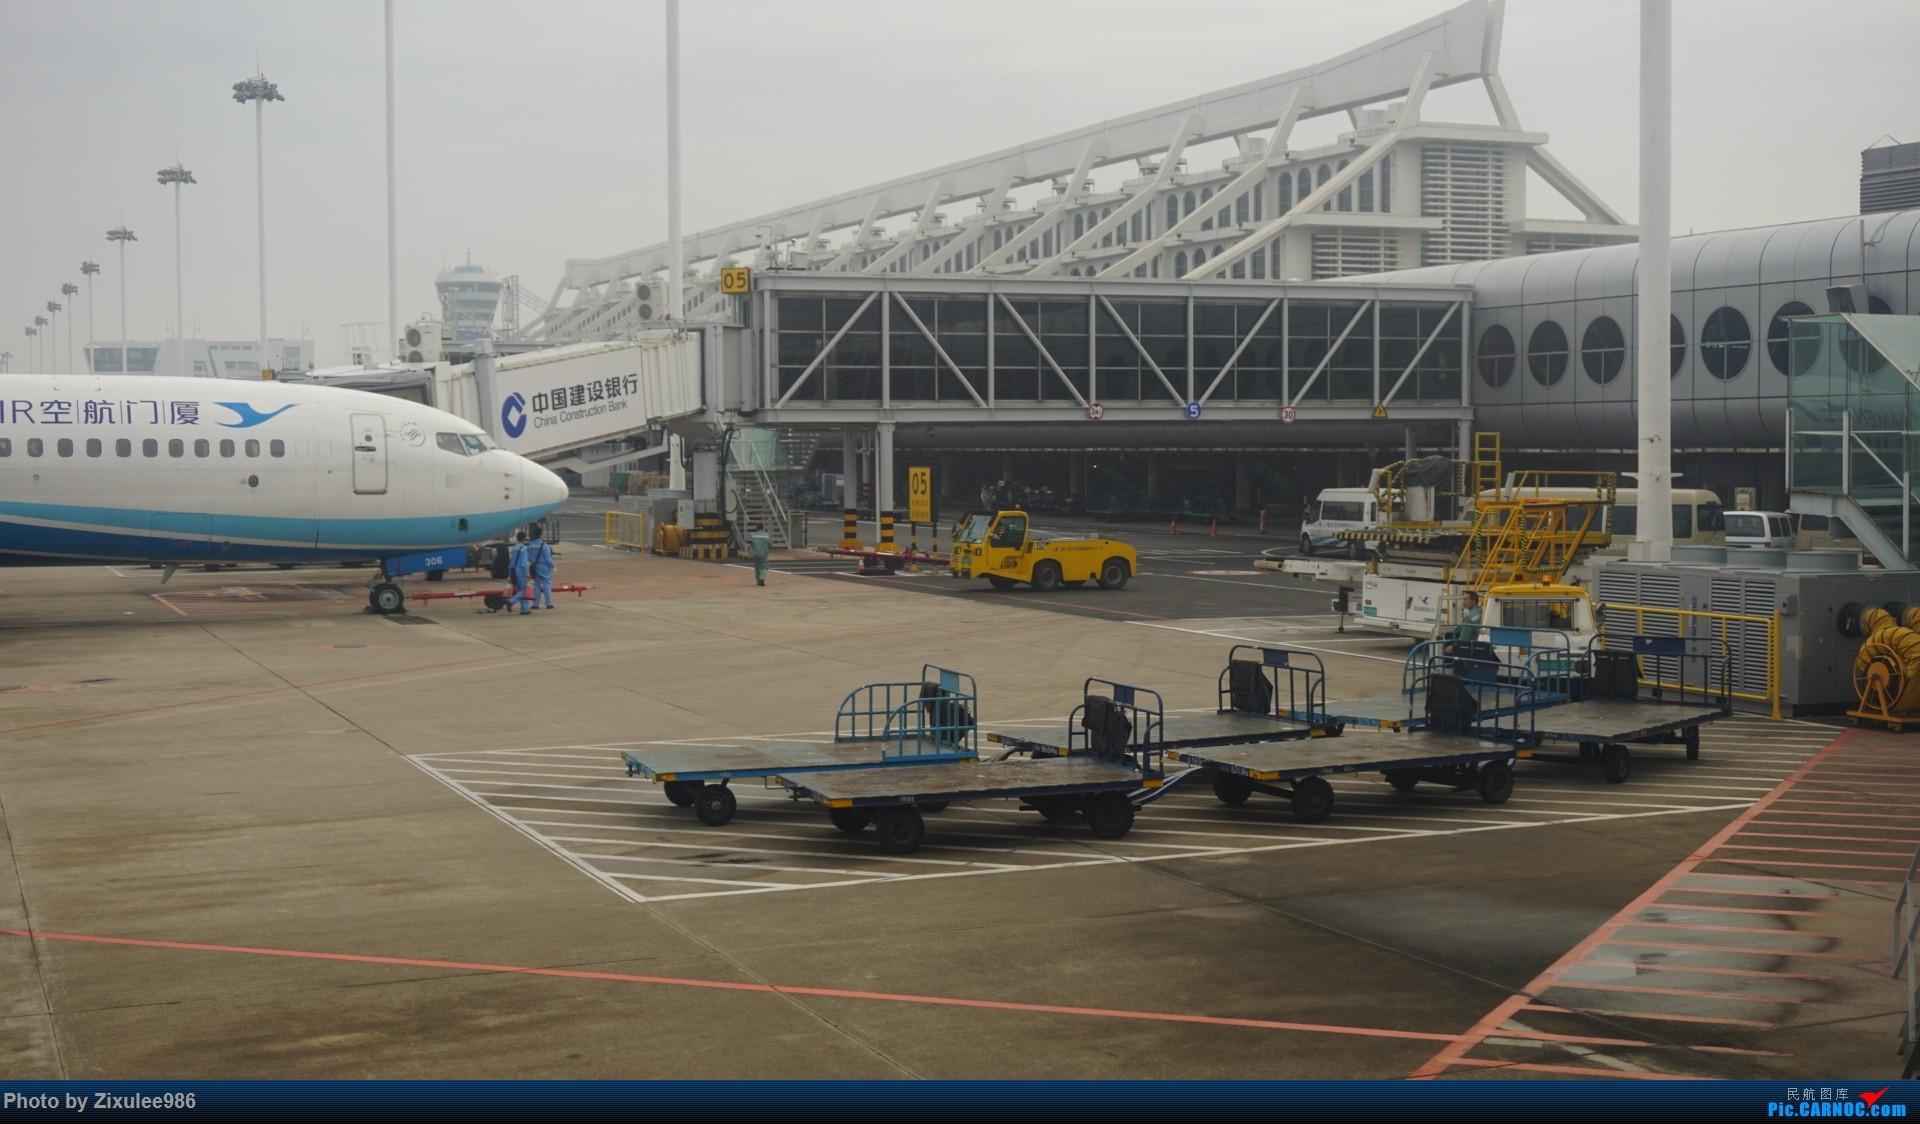 Re:[原创]新年第一次出行~…XMN-NGB-CGO 沿途拍机..多图 BOEING 737-800 B-5306 中国厦门高崎国际机场